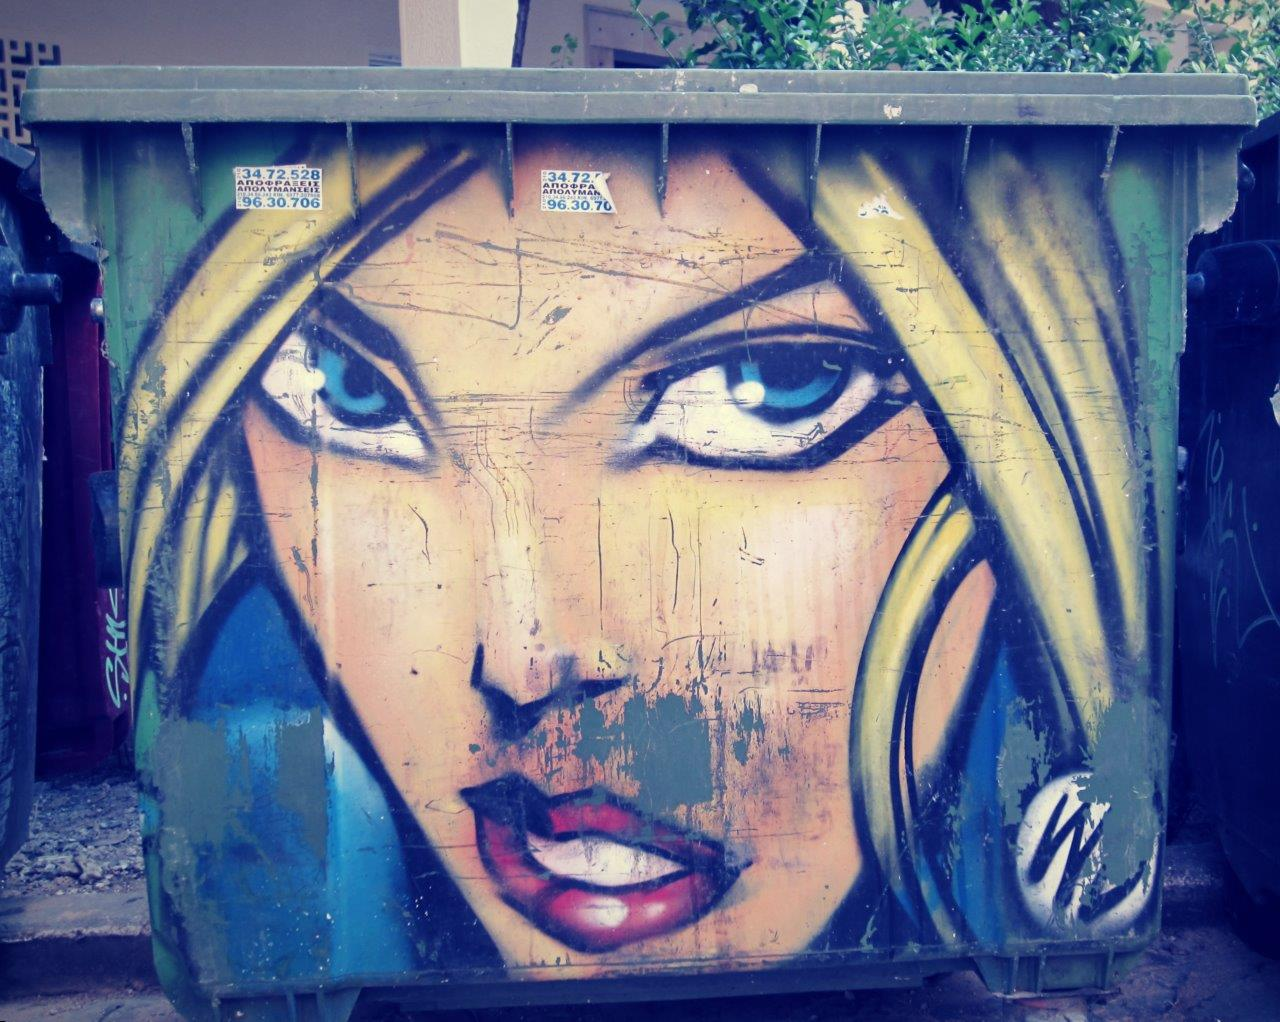 Athens street art - A bin